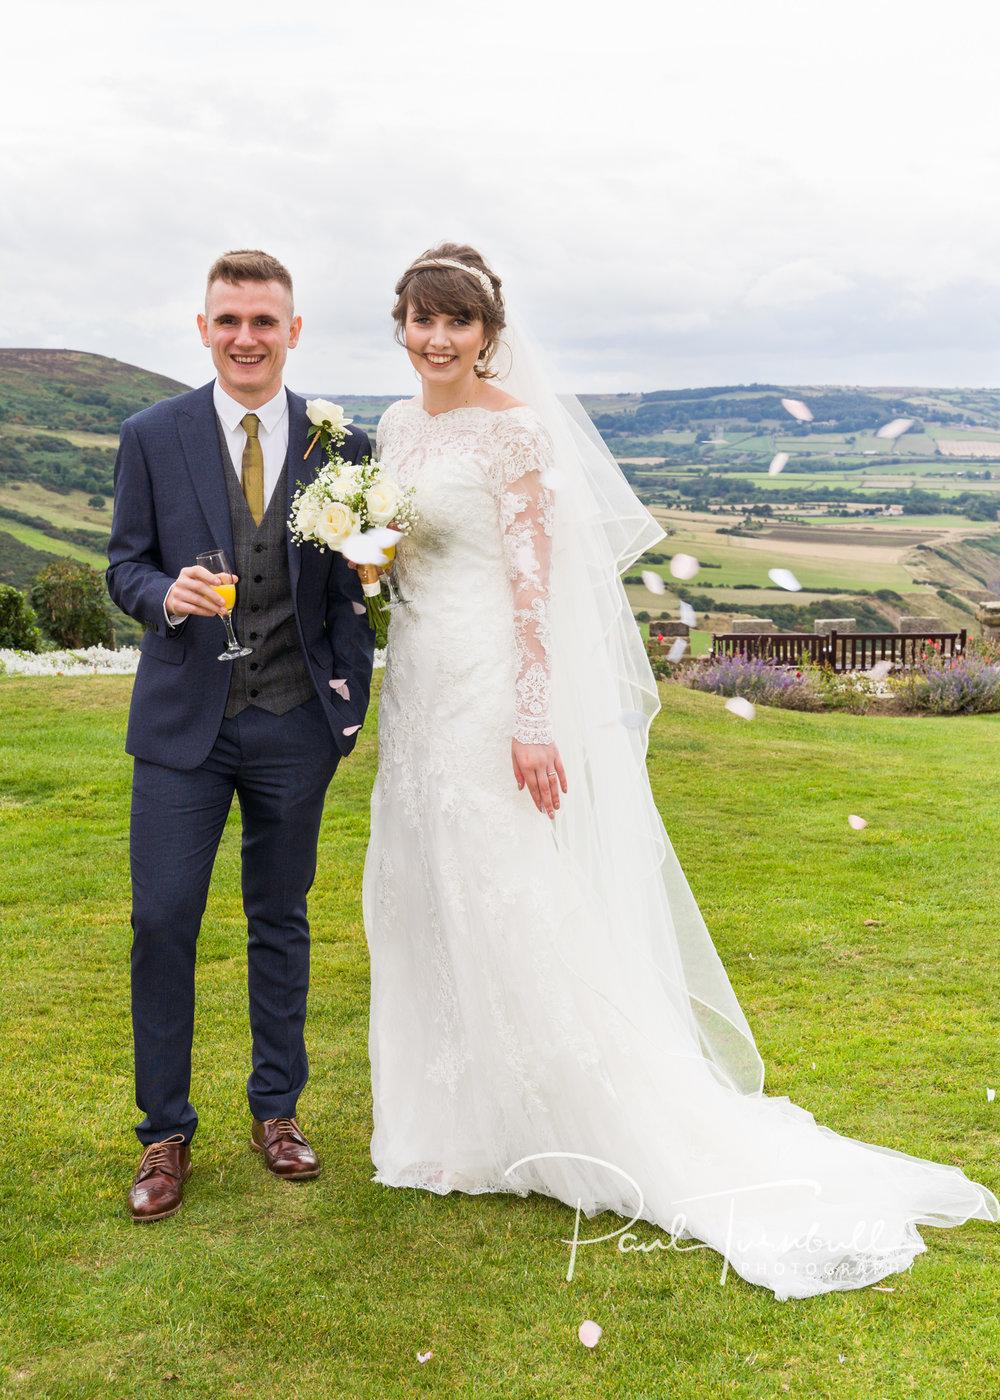 wedding-photographer-raven-hall-ravenscroft--scarborough-yorkshire-lucy-ryan-064.jpg